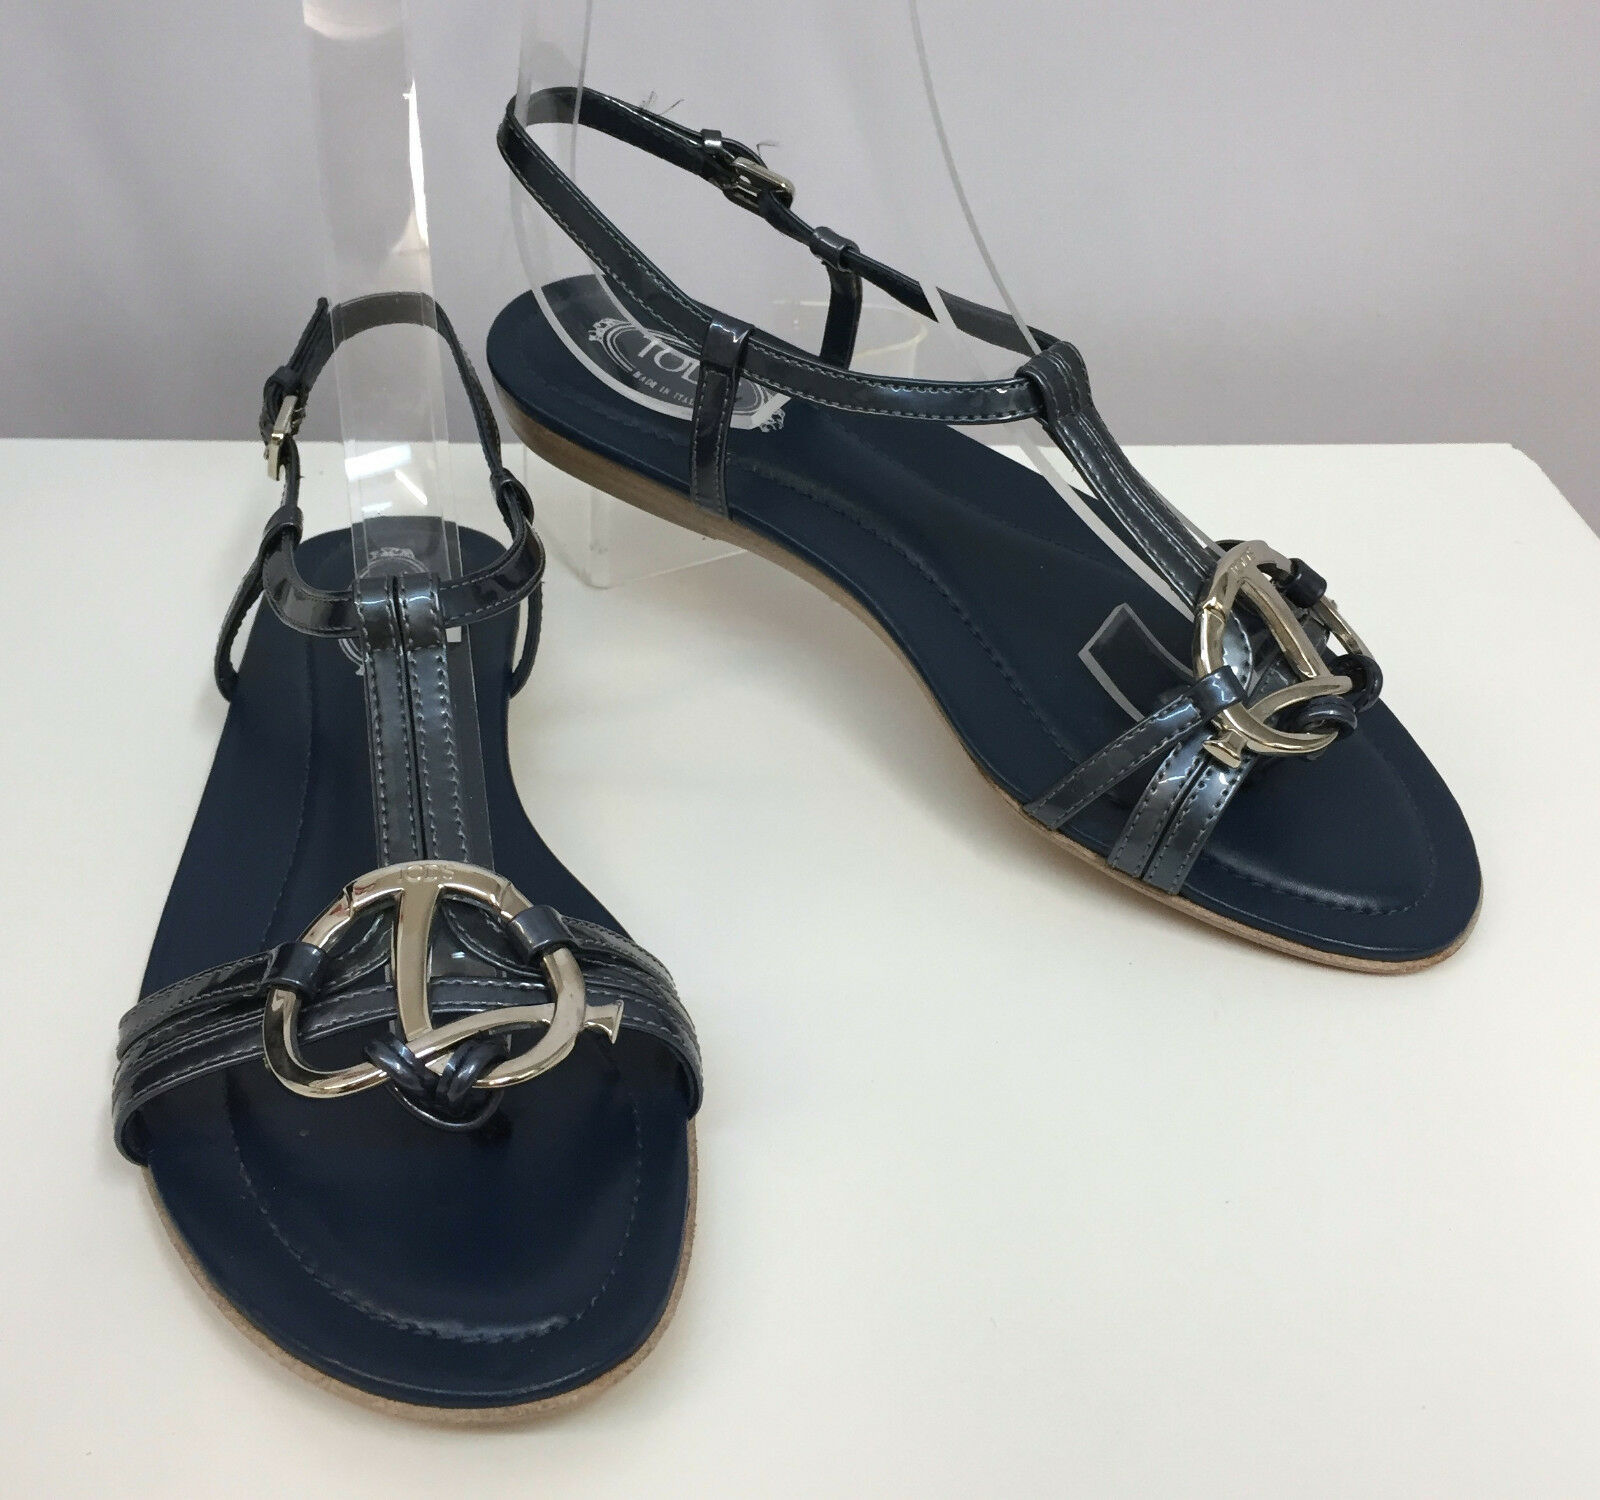 Tod'S Sandalias Zapatos Charol Azul Excelente Hardware De Metal Tono Plata 36 1 2